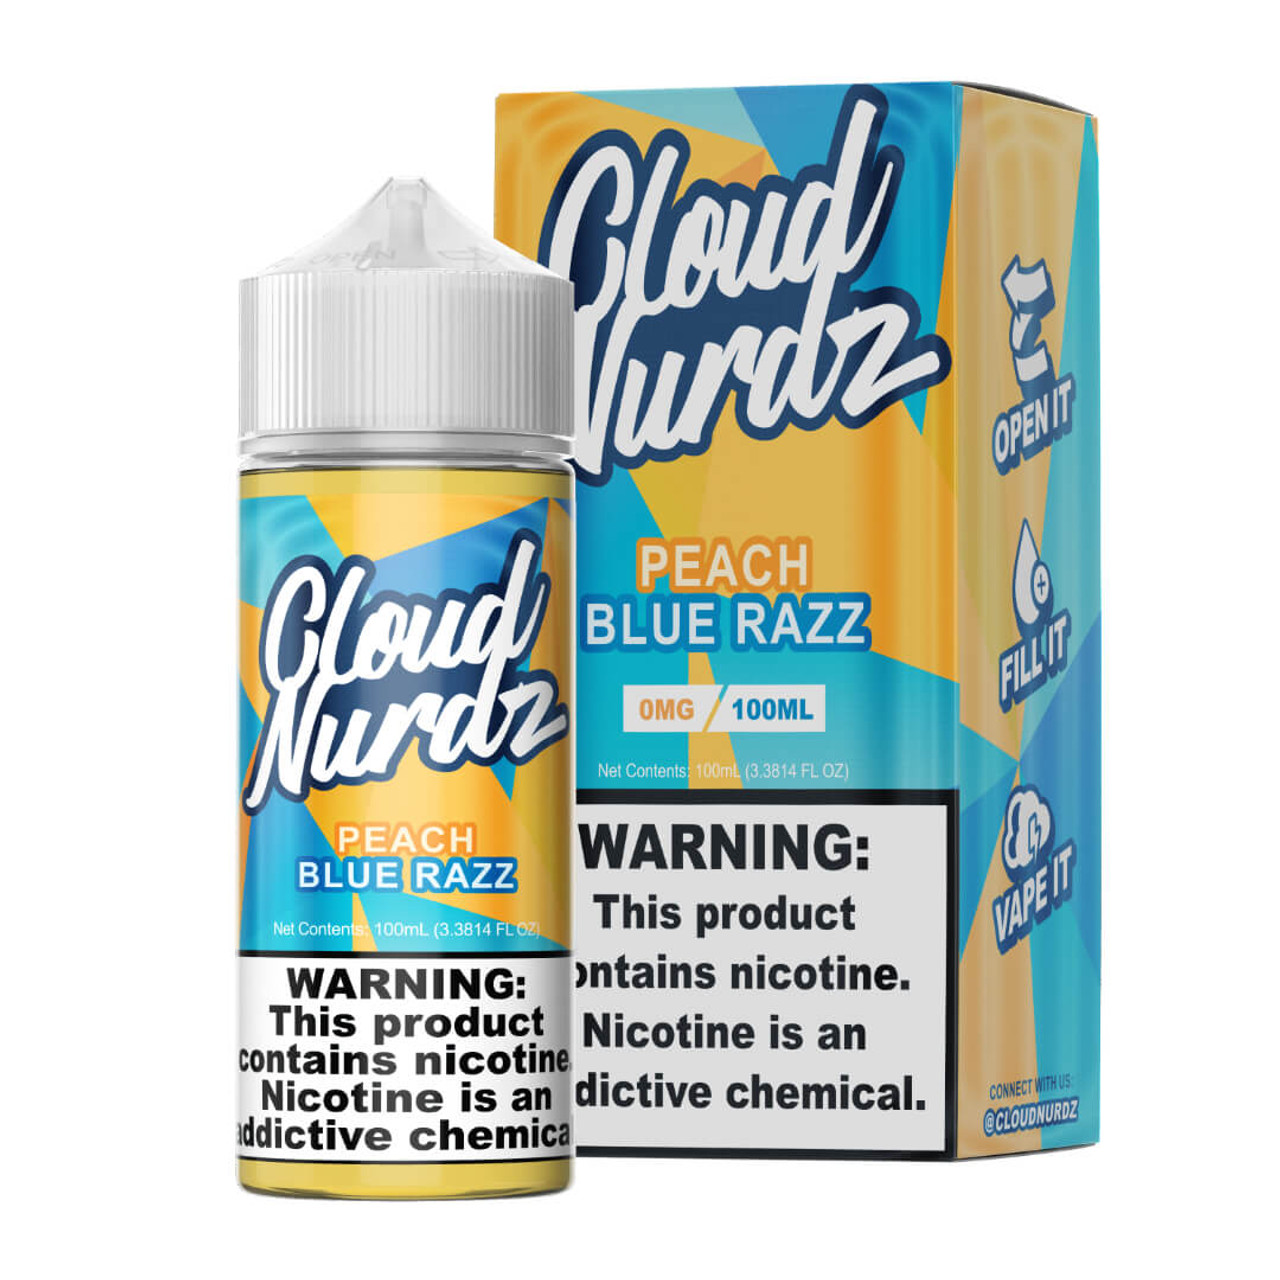 Cloud Nurdz Peach Blue Razz 100ml E-Juice